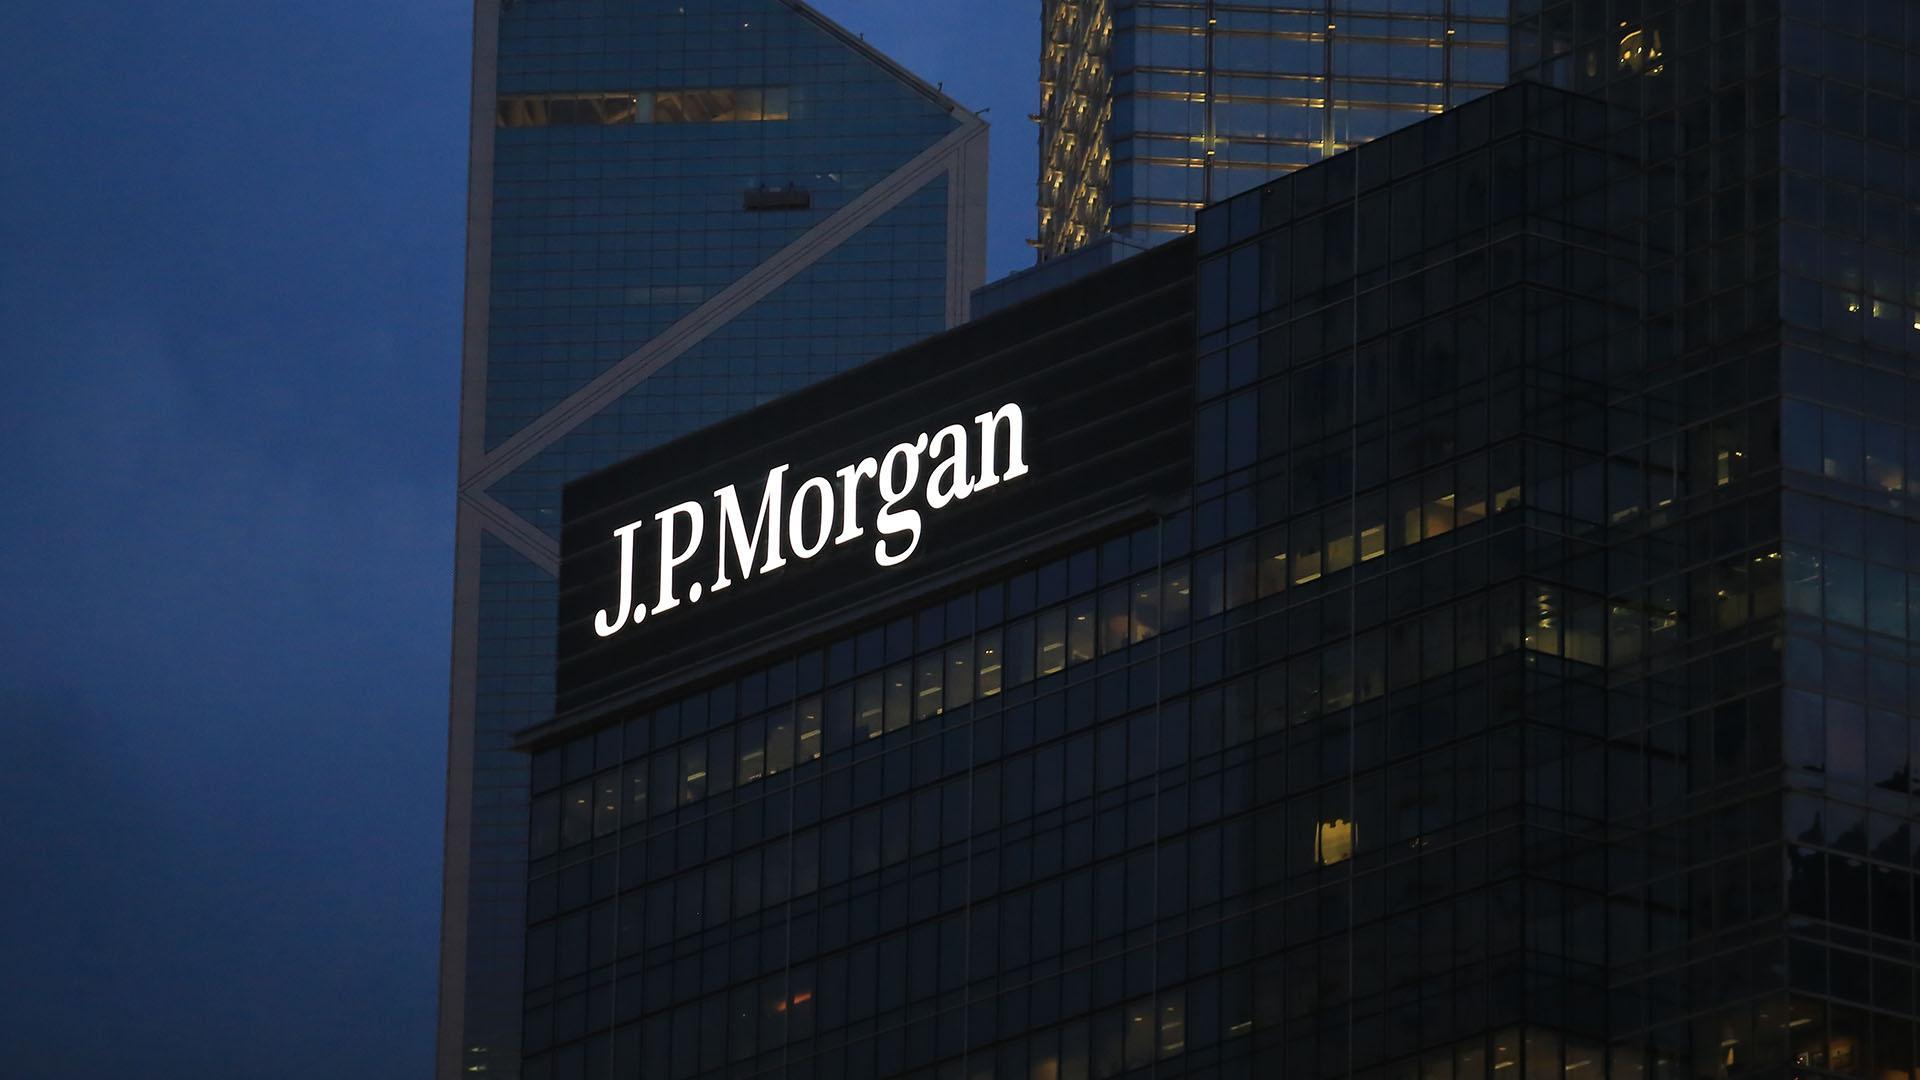 JPMorgan: у BTC есть потенциал для долгосрочного роста